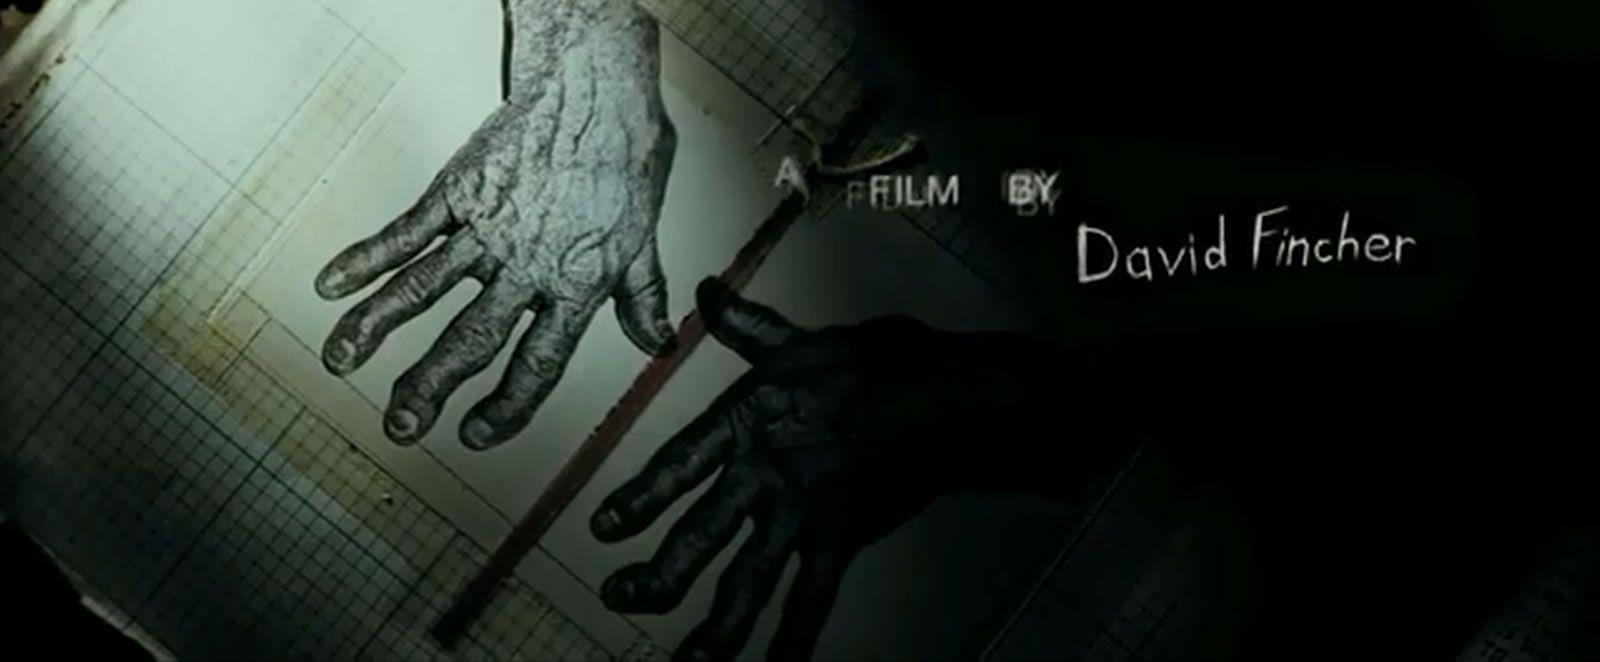 Best Wallpaper Movie Se7en - se7en-opening-credits  Best Photo Reference_134020.jpg